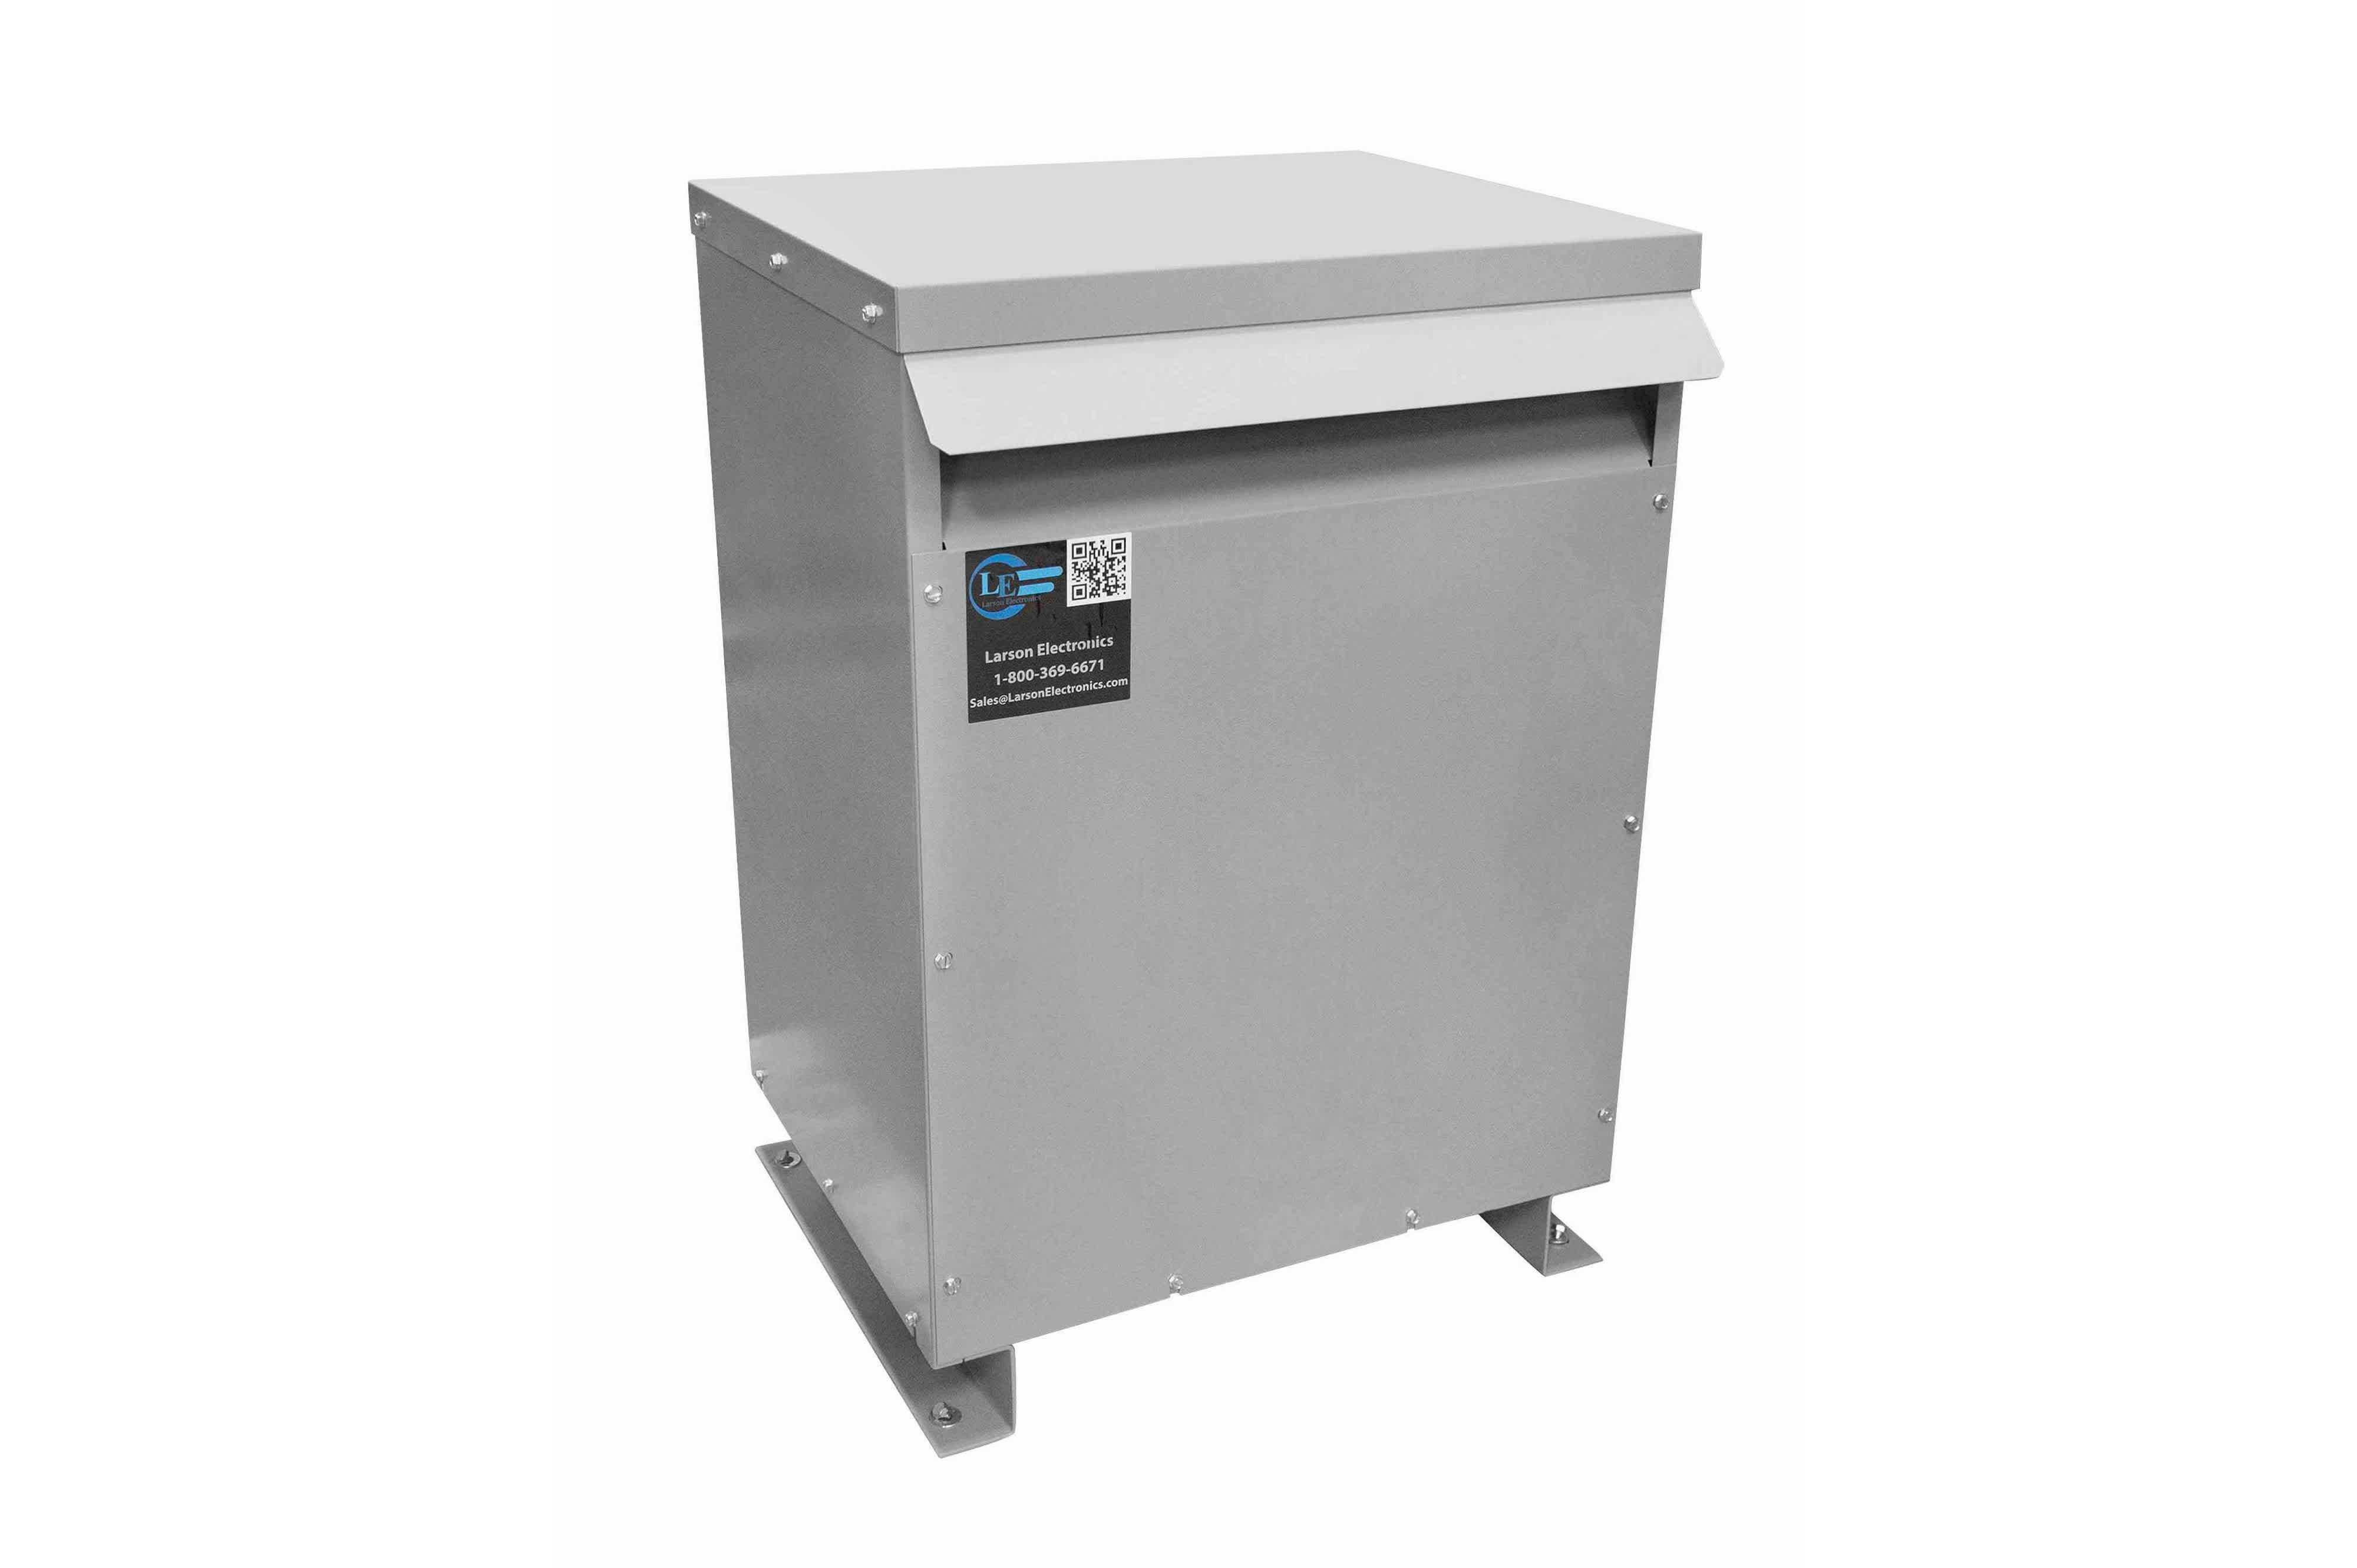 50 kVA 3PH Isolation Transformer, 380V Wye Primary, 480V Delta Secondary, N3R, Ventilated, 60 Hz